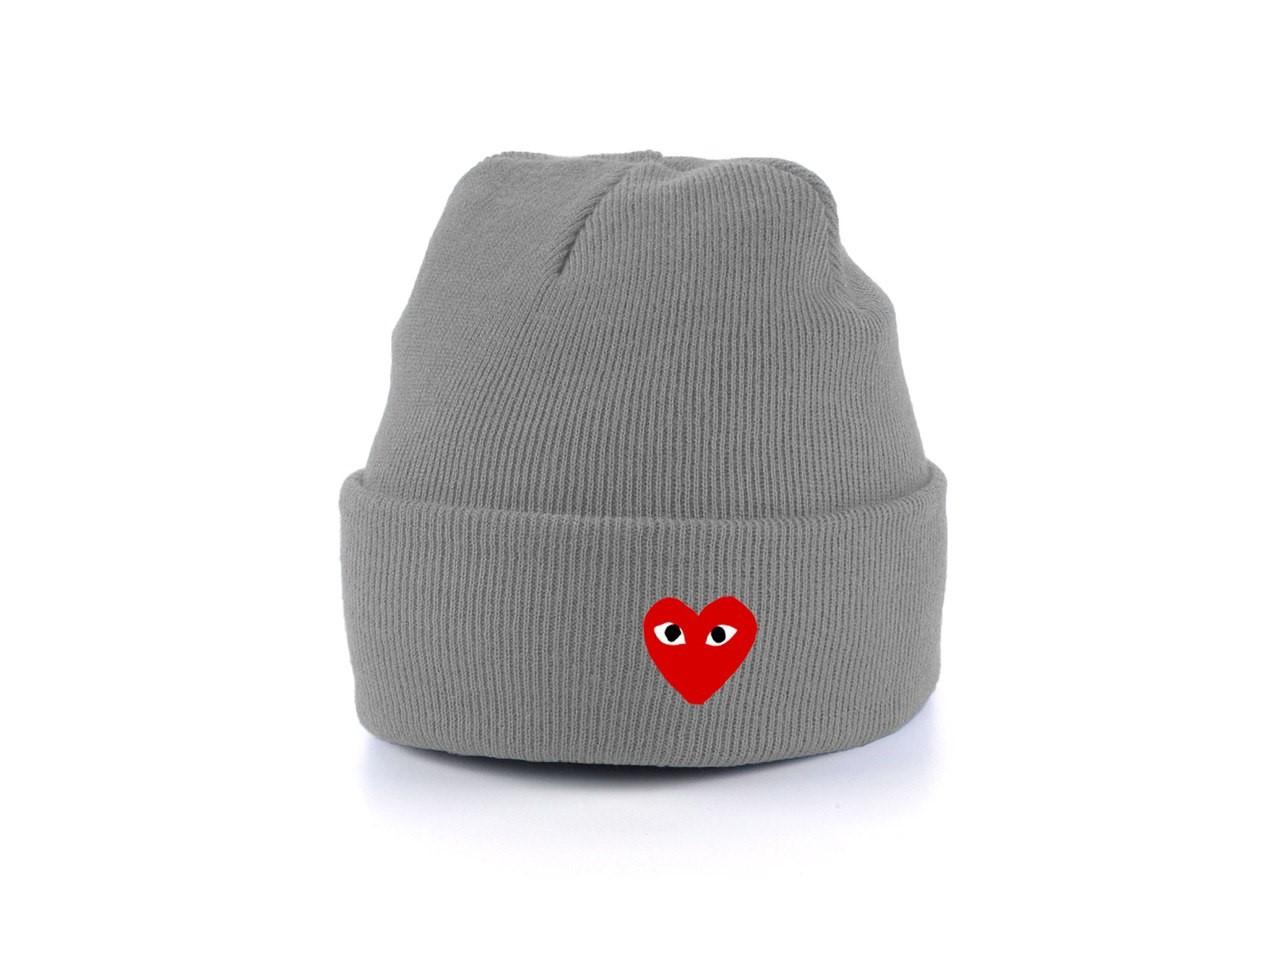 Мужская теплая шапка Play универсальный размер